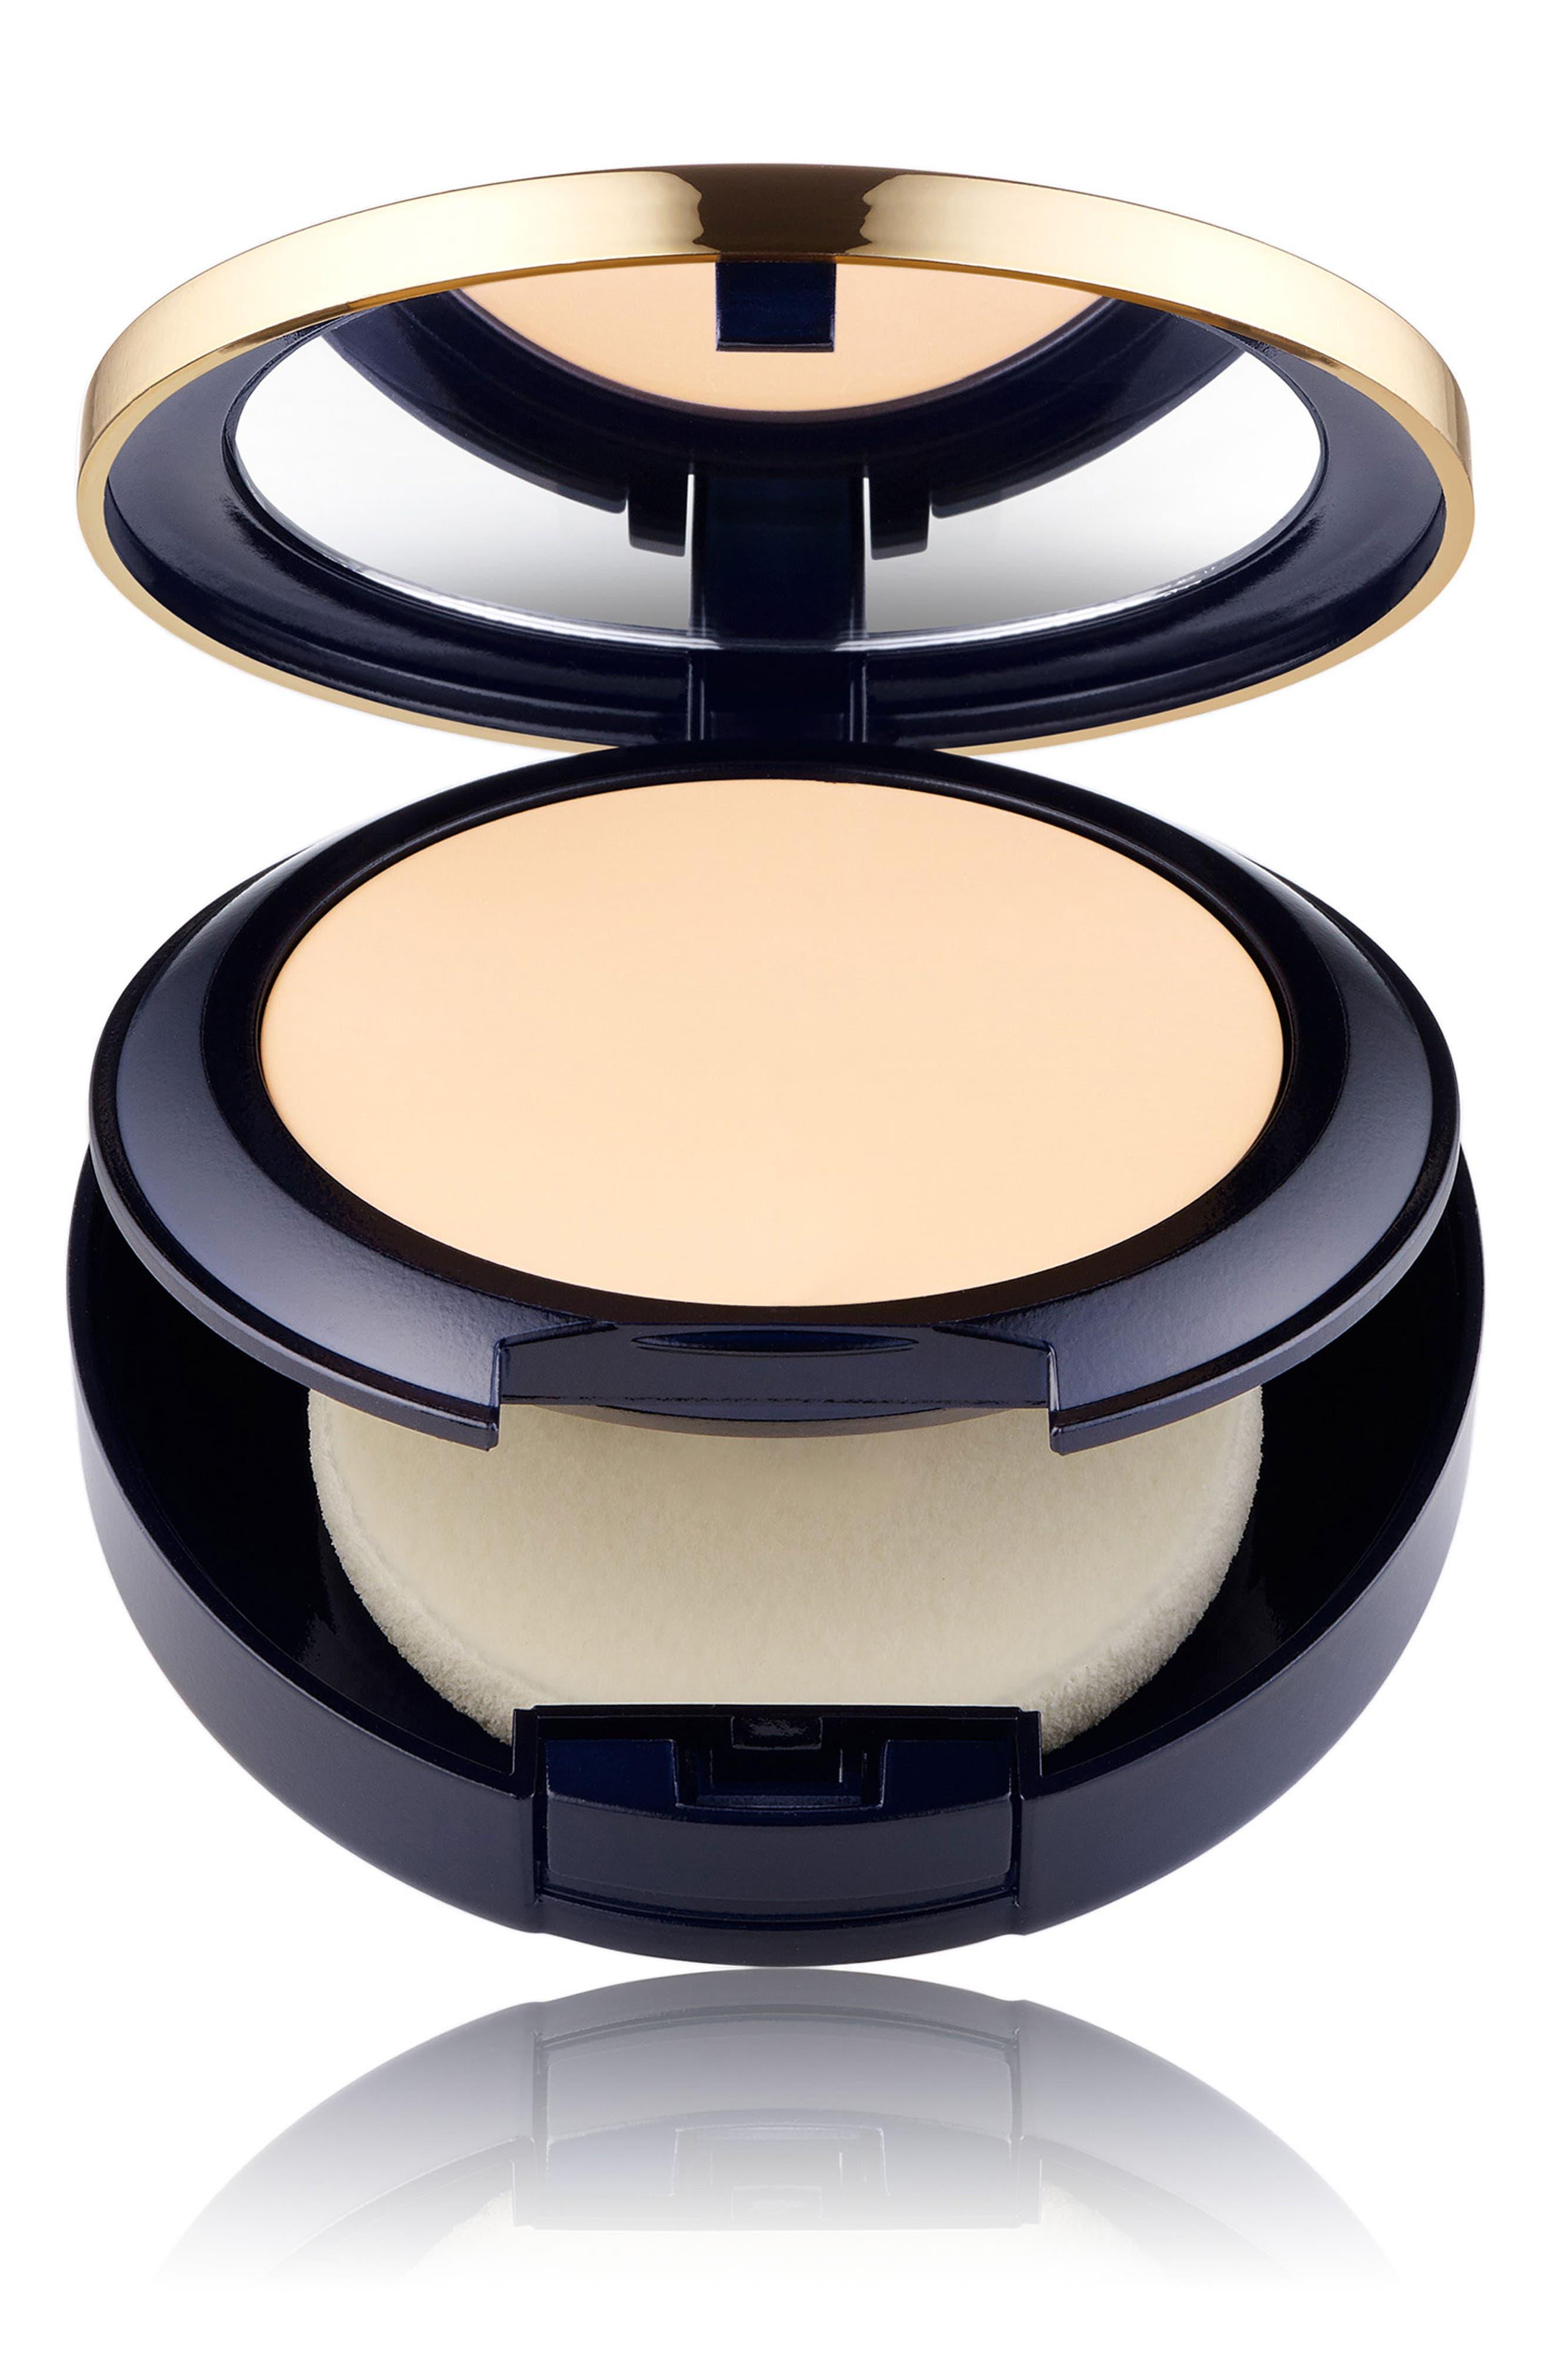 Estee Lauder Double Wear Stay In Place Matte Powder Foundation - 1N1 Ivory Nude